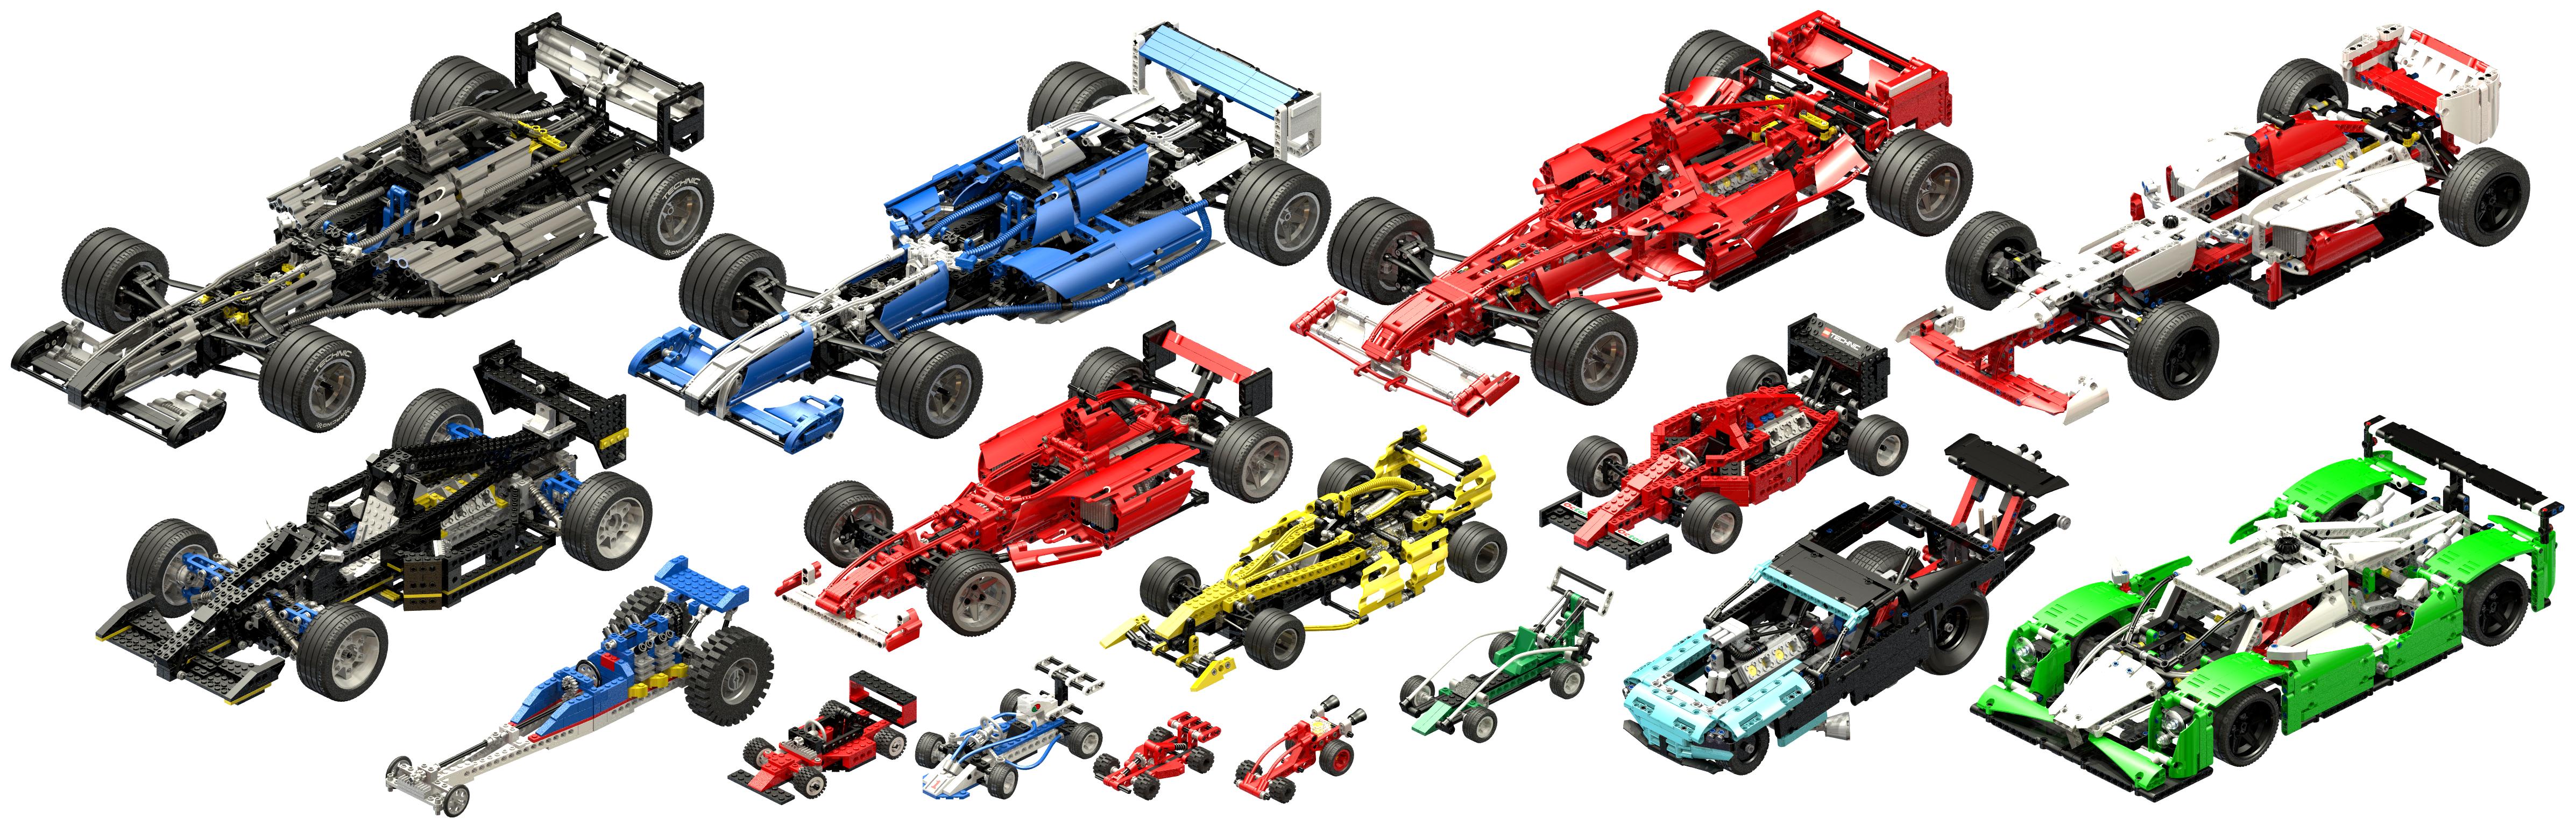 Technicopedia: Race Cars